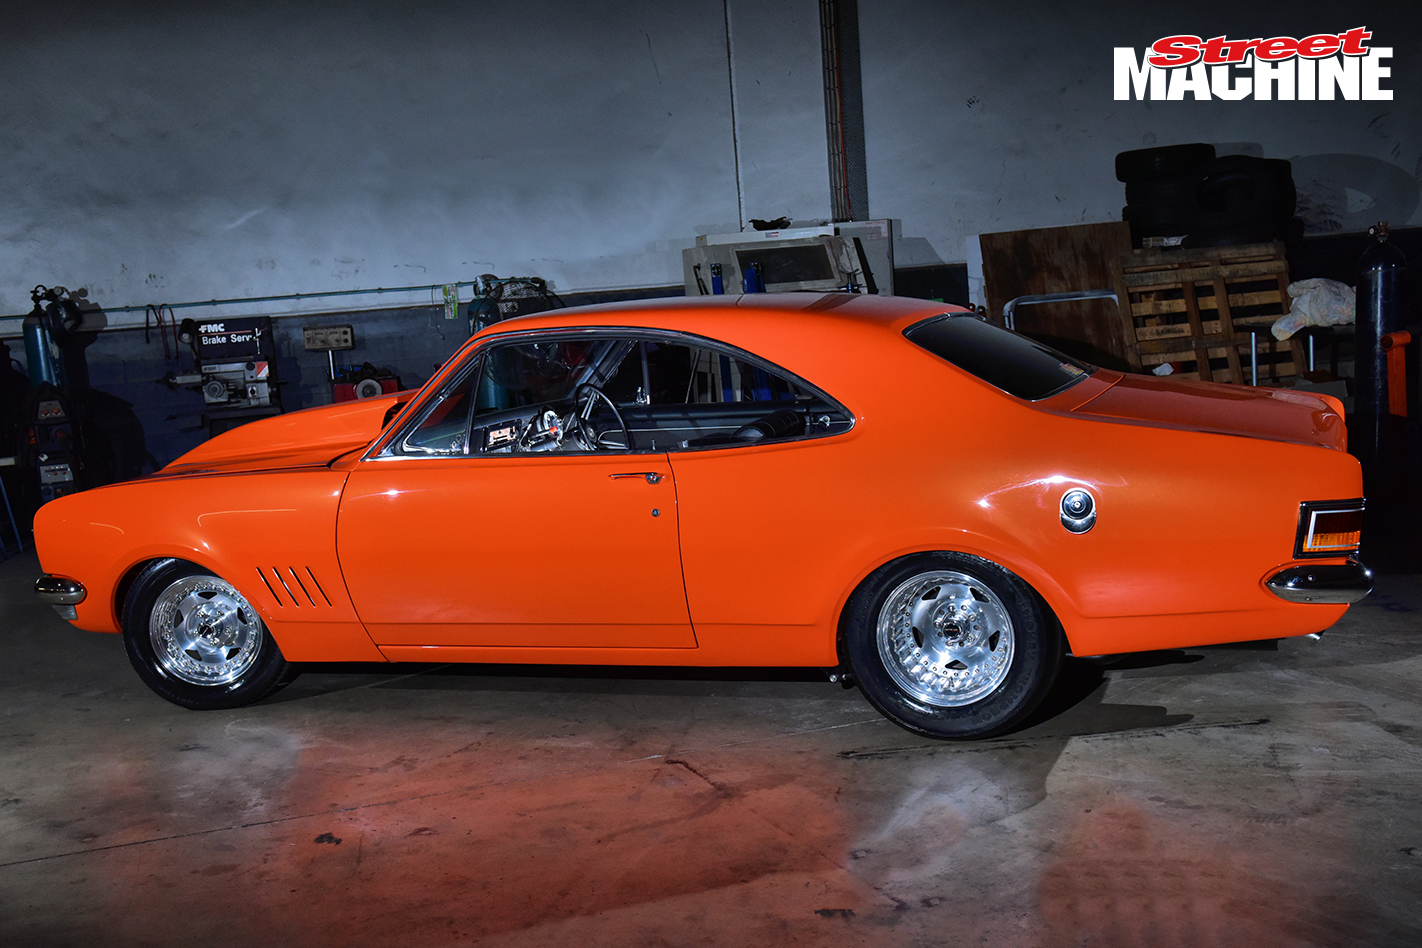 HG Holden Monaro 427 2 Nw